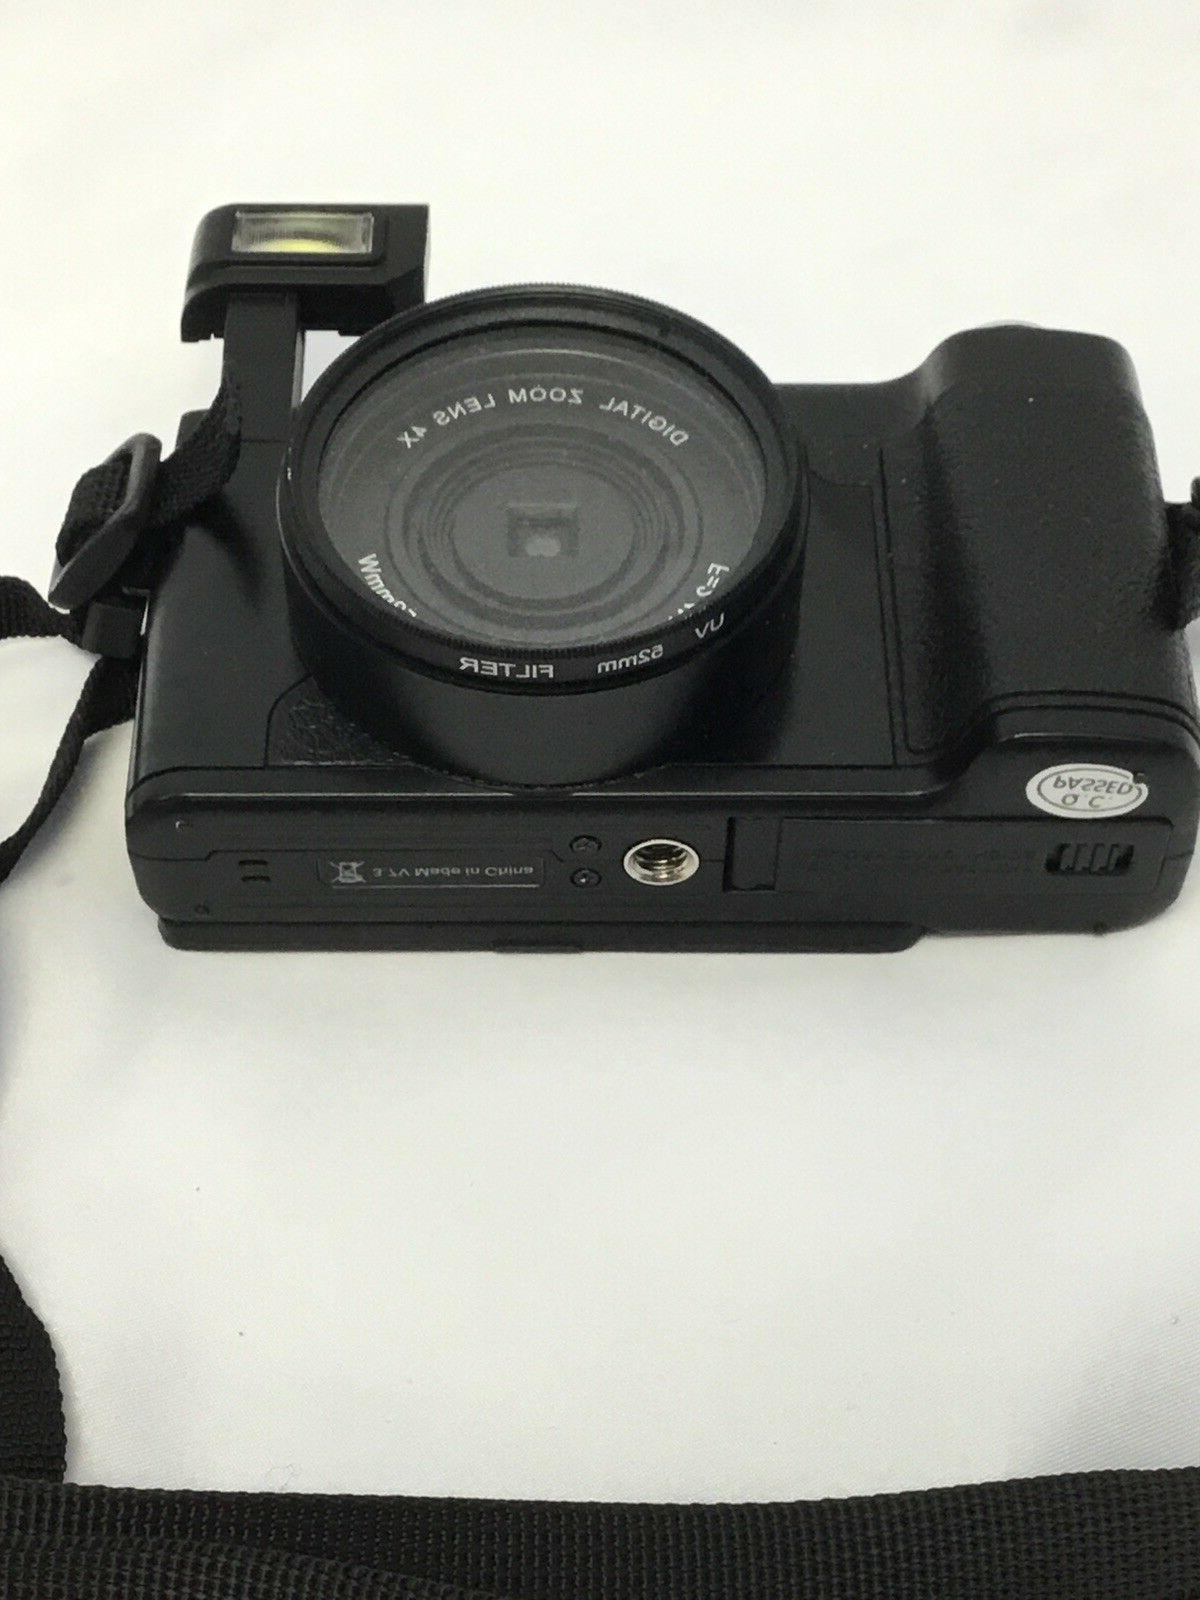 SEREE HD Digital Camcorder Full 24.0 Zoom